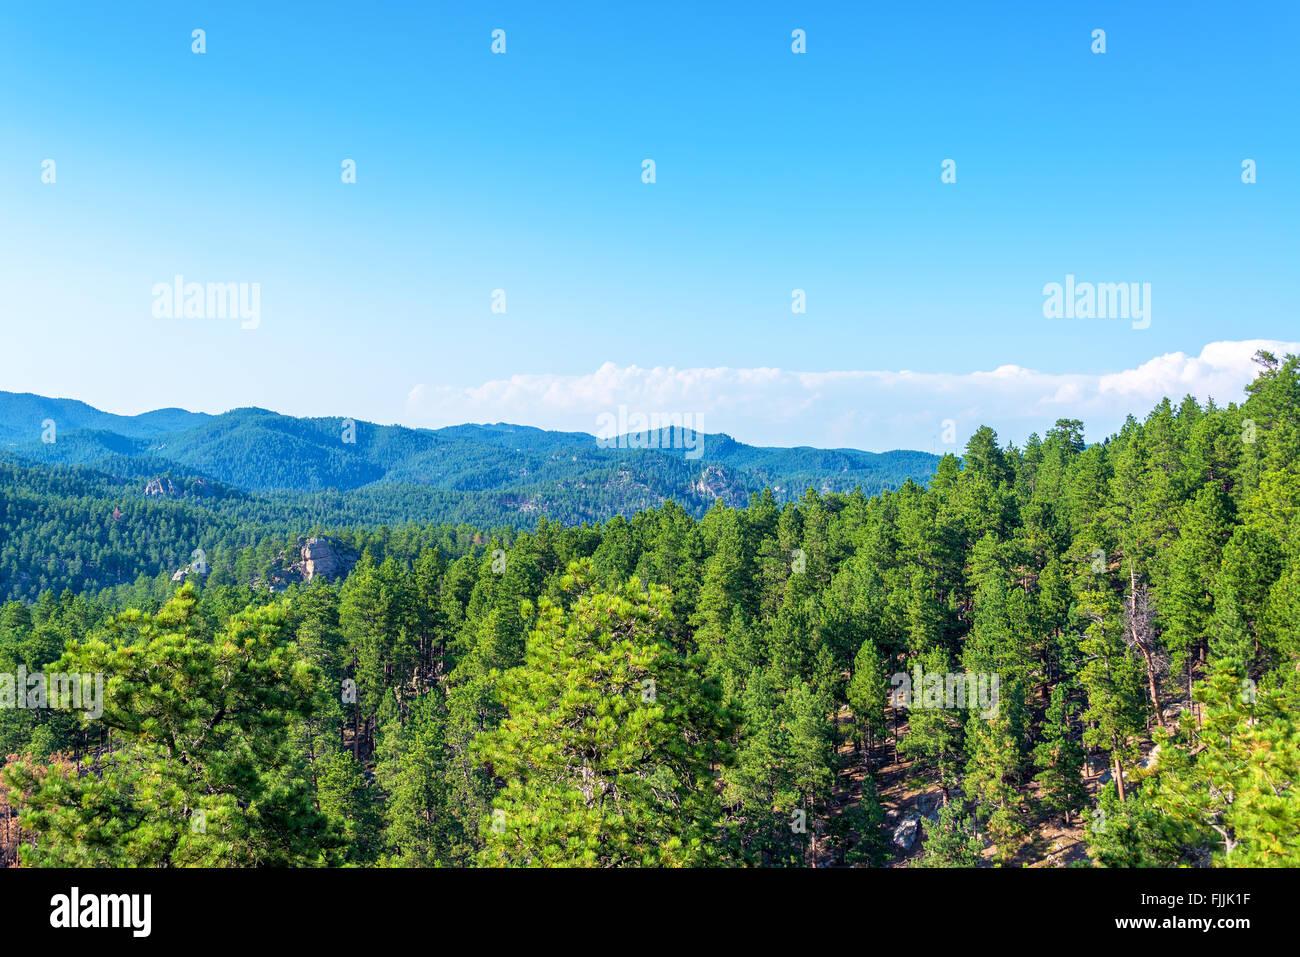 Black Hills National Forest in South Dakota - Stock Image